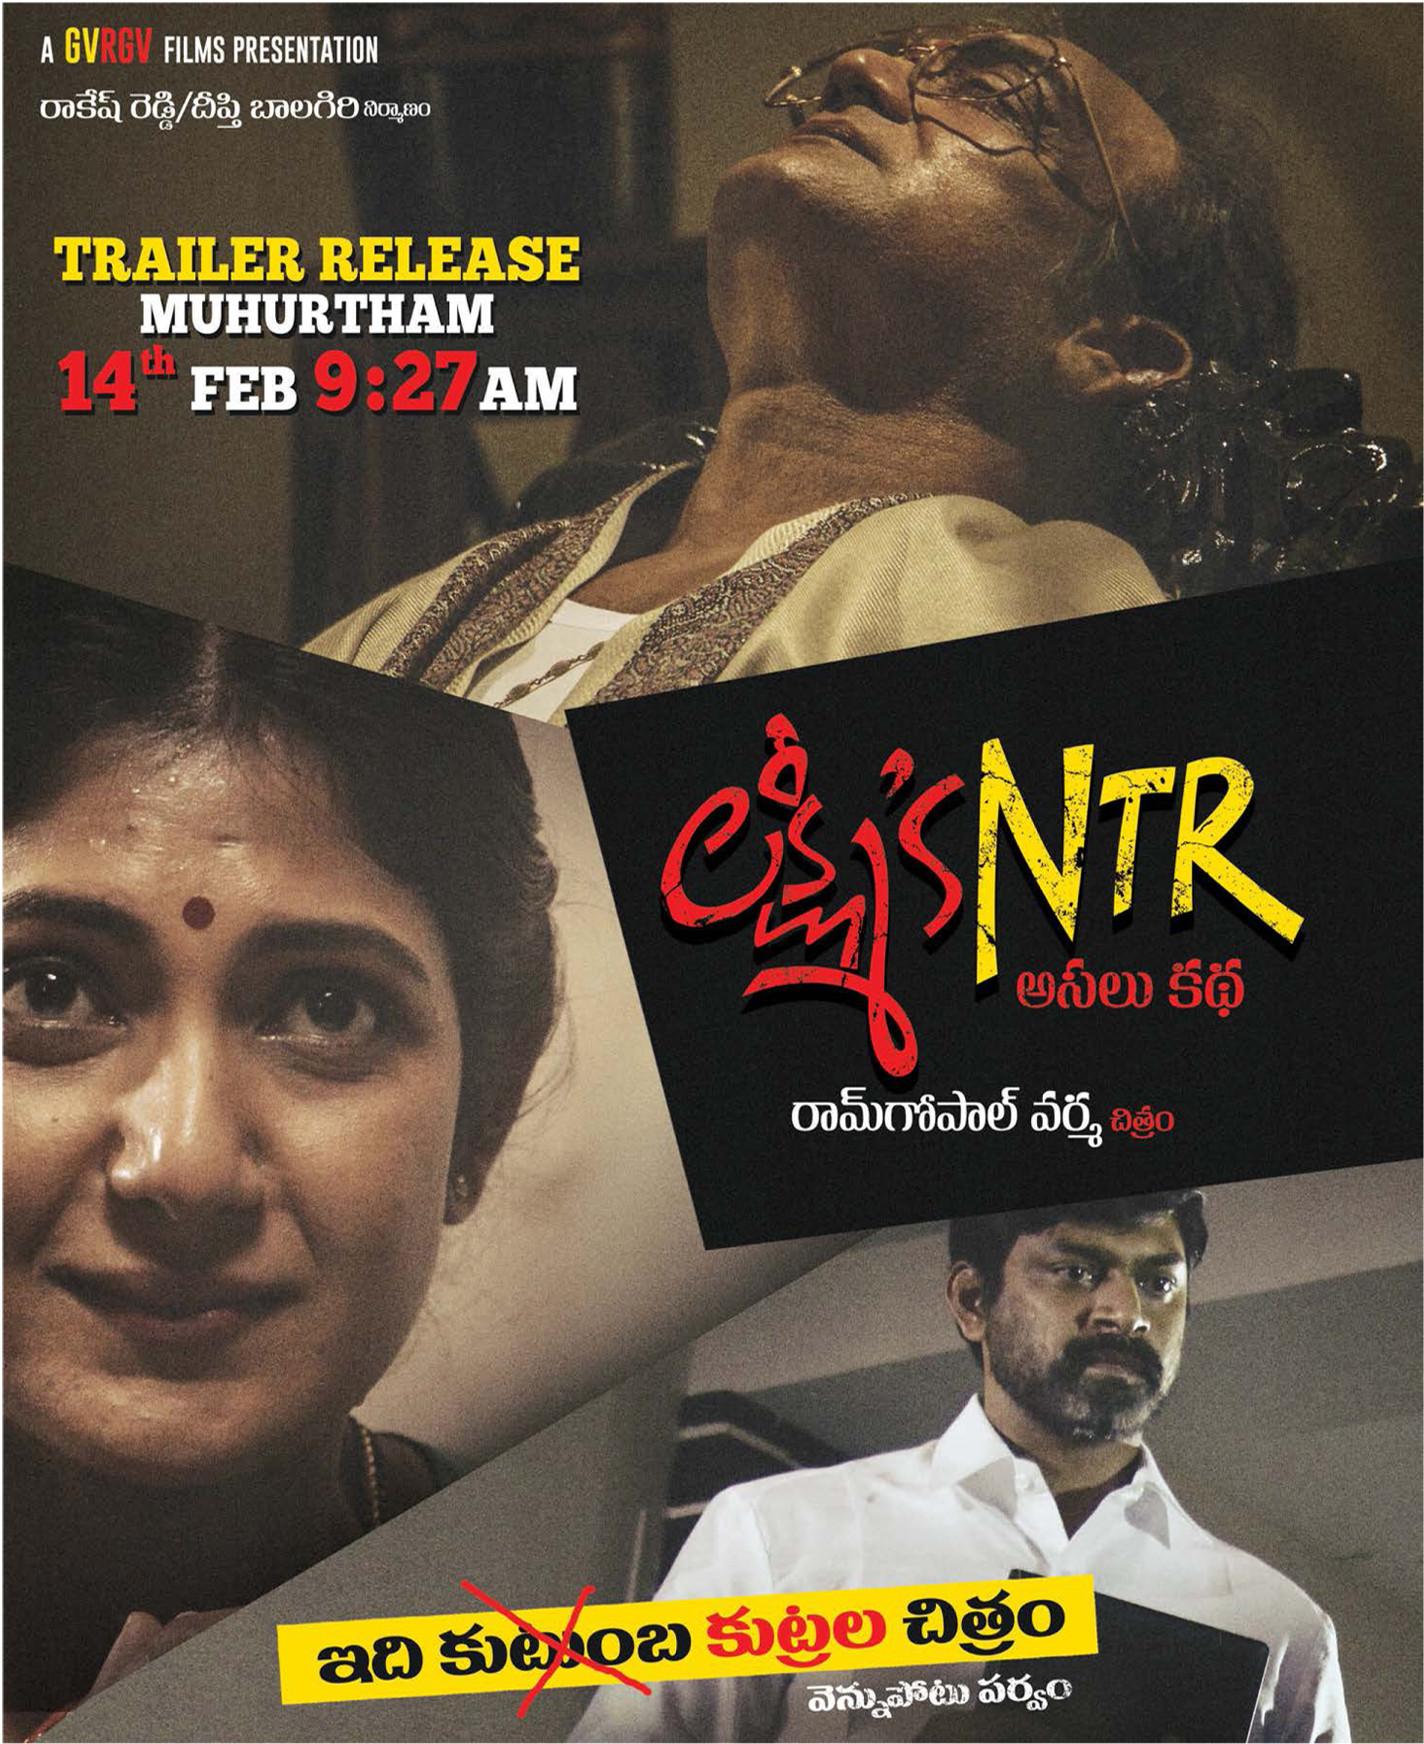 Yagna Shetty, Rajsekhar Aningi in Lakshmi's NTR Movie Trailer Release Today Posters